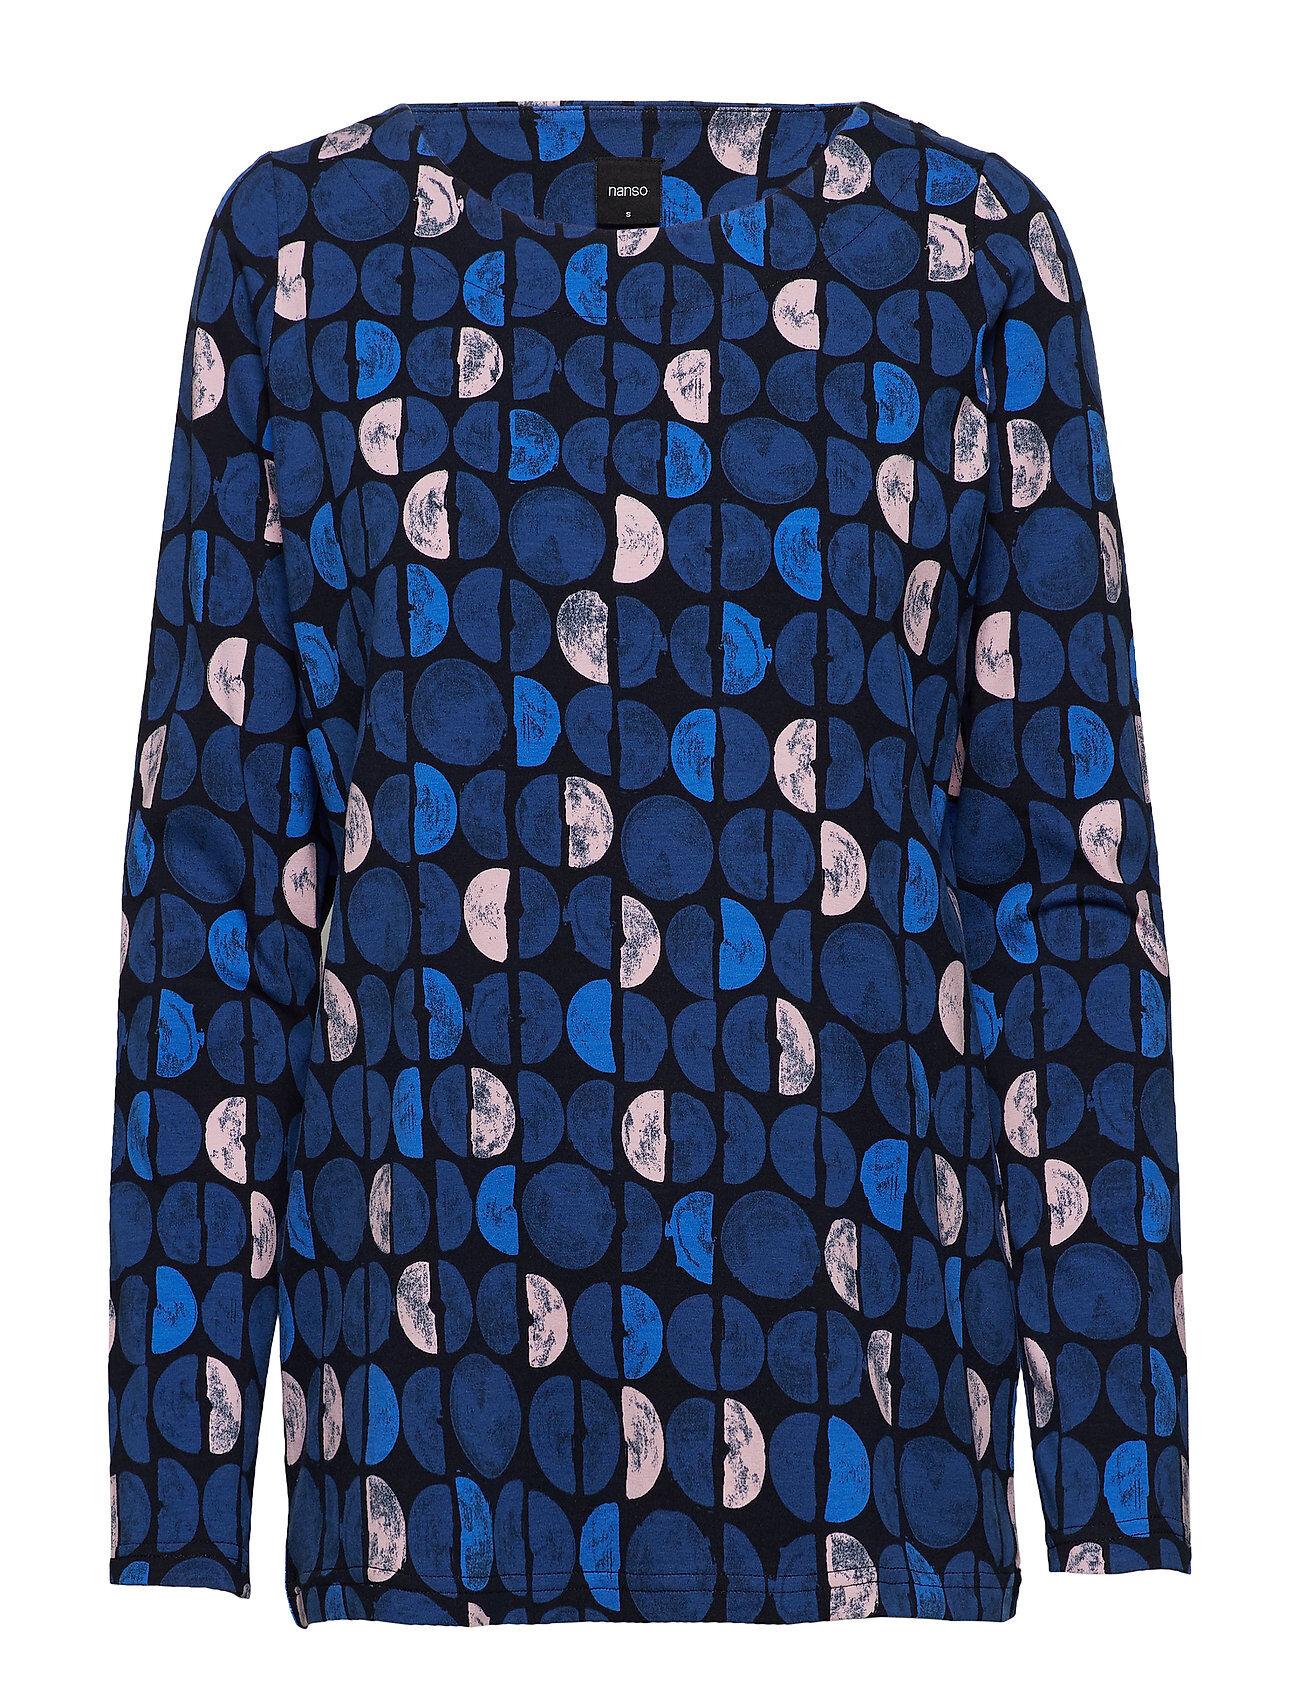 Nanso Ladies Shirt, Puolikas